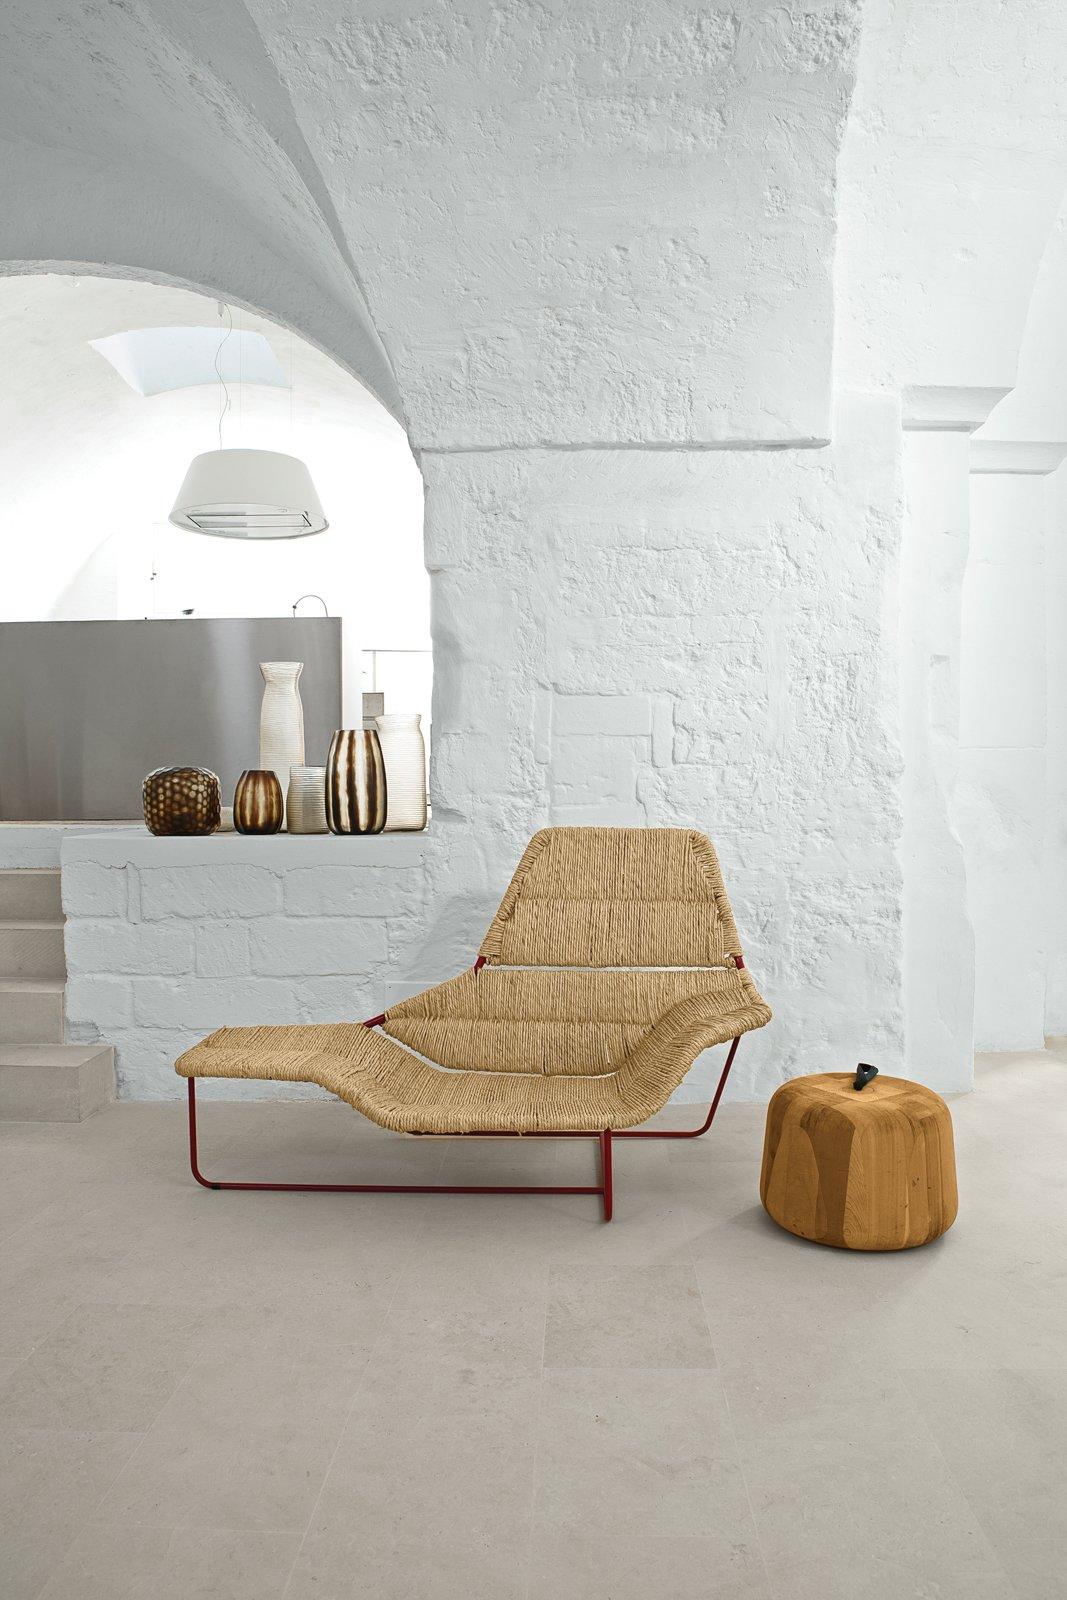 #seatingdesign #cavernous #livingroom #Lama #chaiselounge #ZenApple #sidetable #Guaxs #vases #PalombaResidence #Ludovica+Roberto Palomba  100+ Best Modern Seating Designs